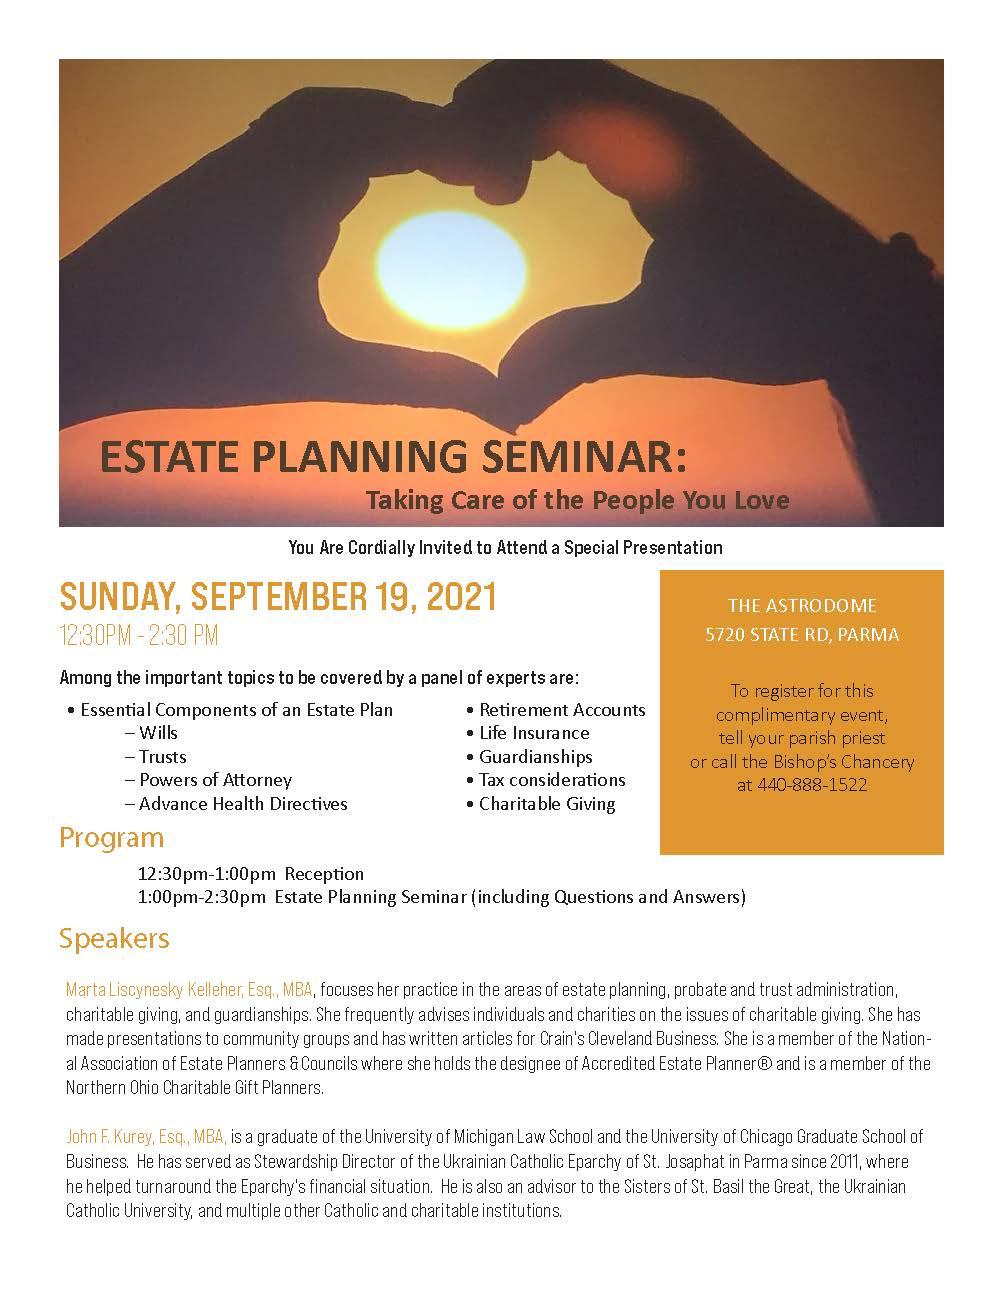 Complimentary Estate Planning Seminar